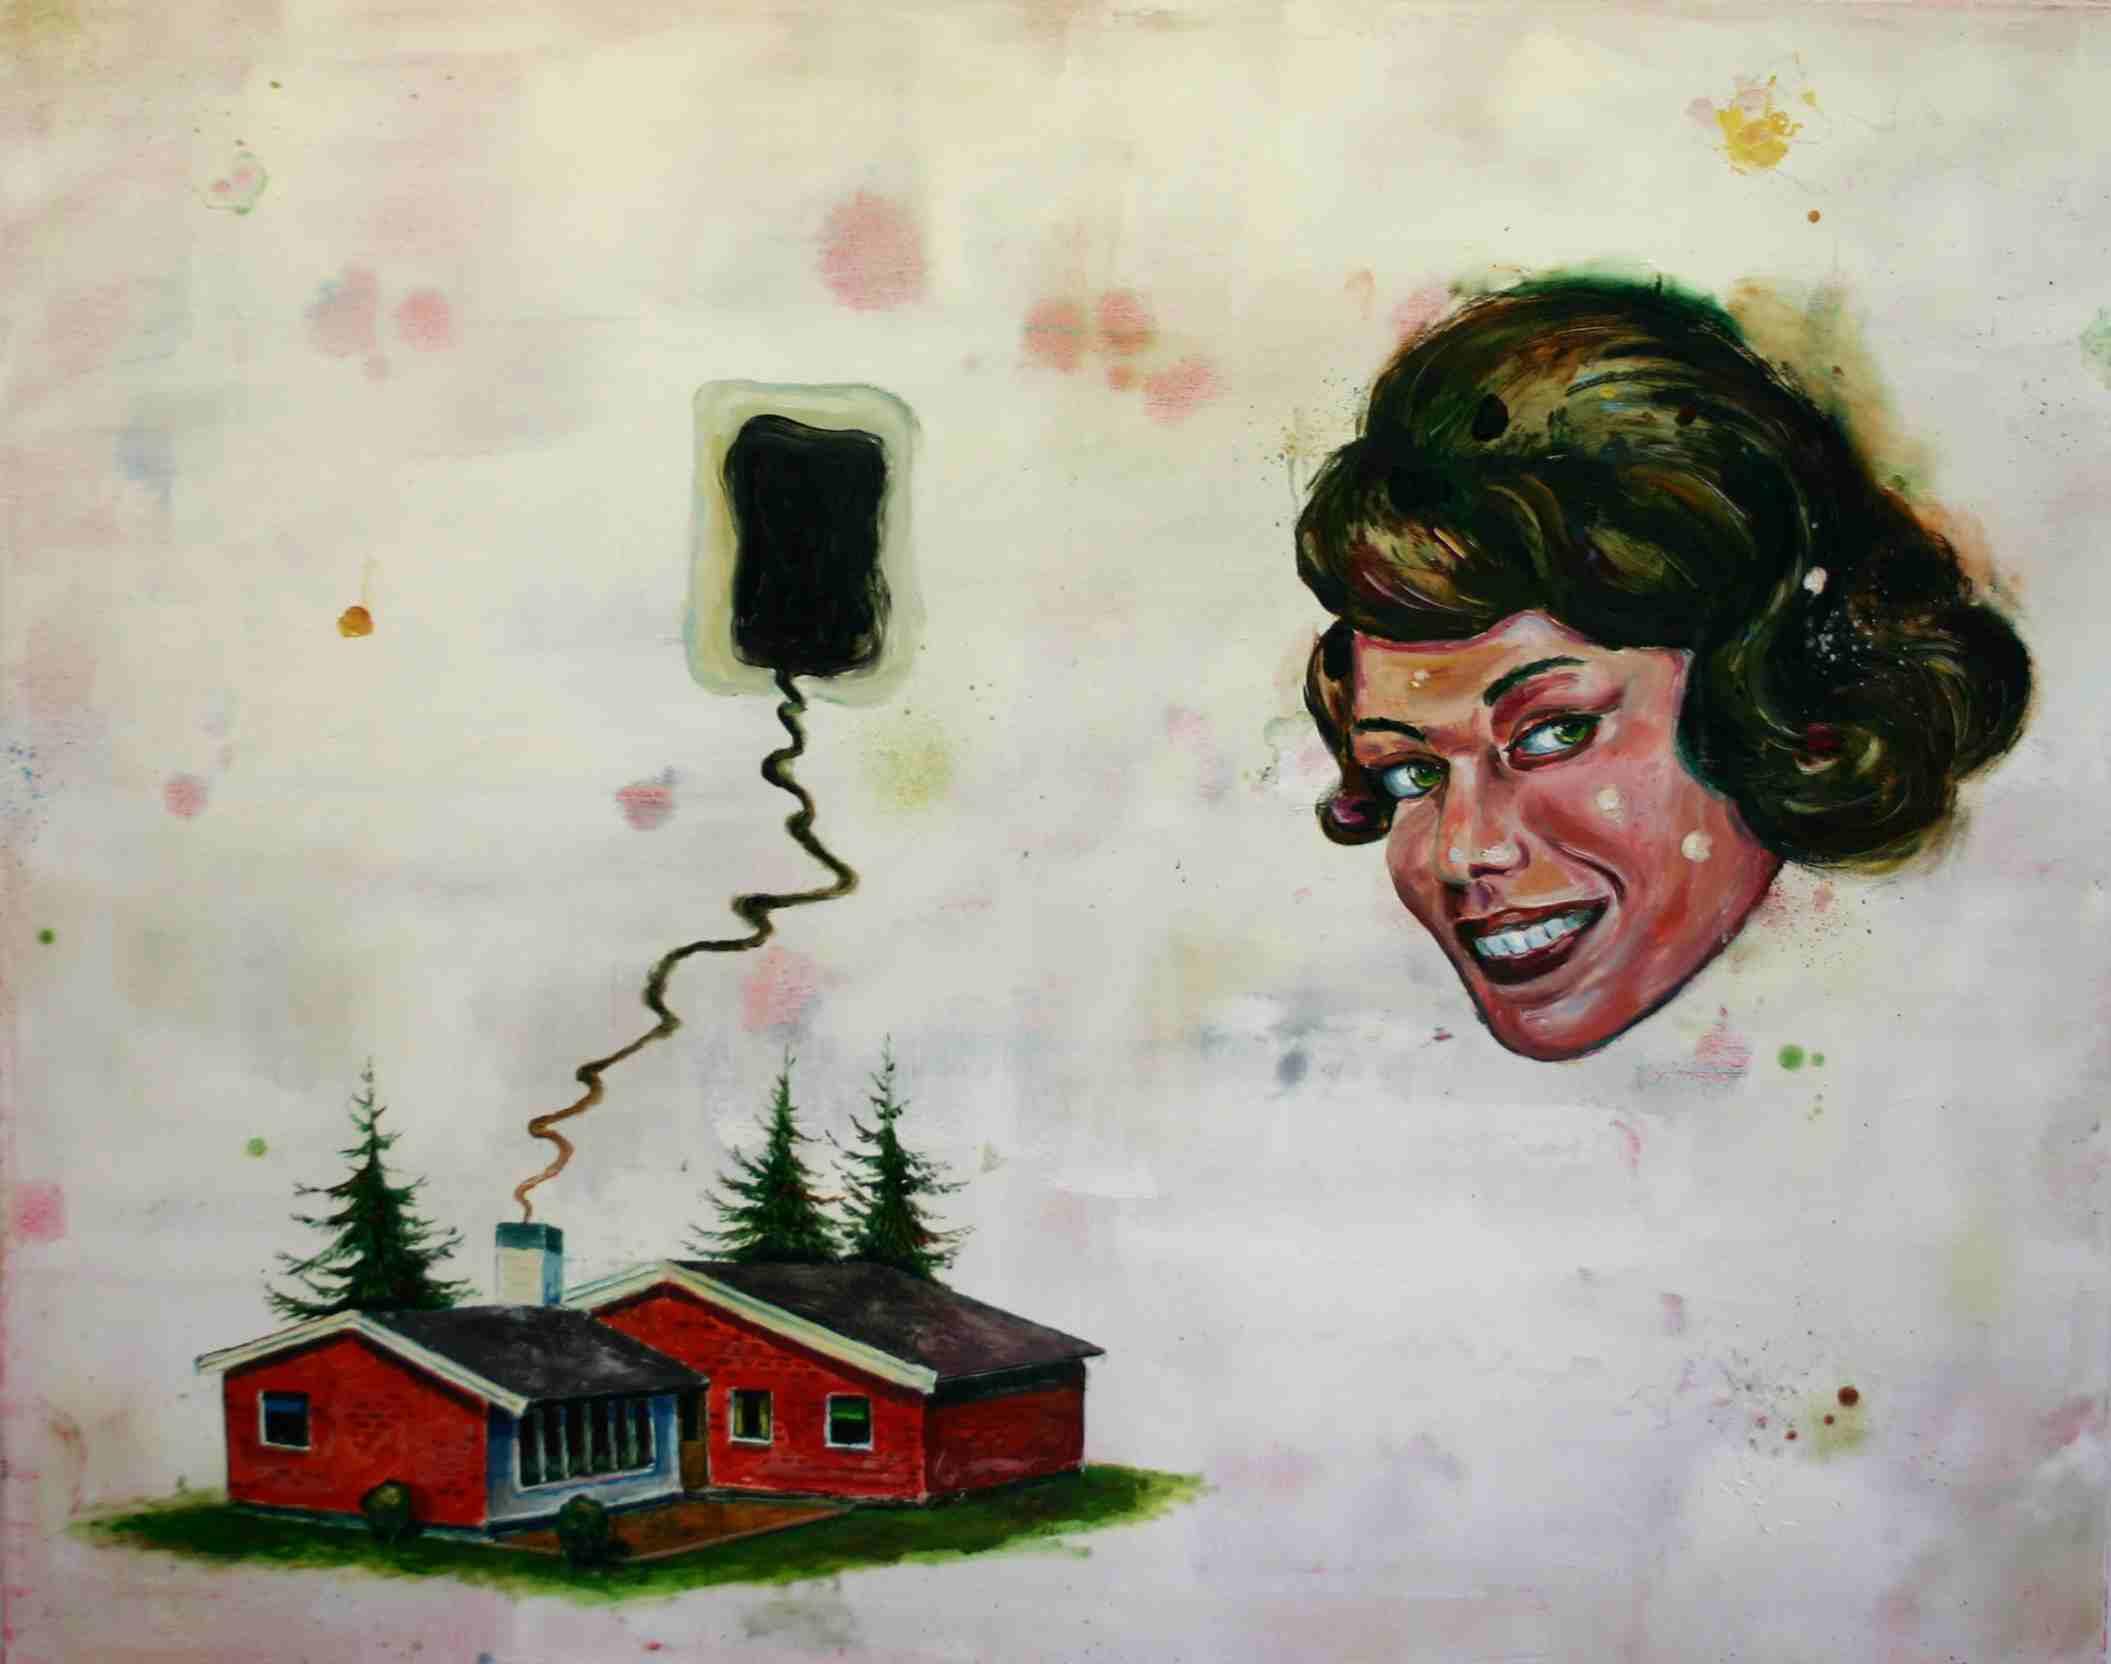 Olle Schmidt, Big Dream, 2015, oil on canvas, 80 x 120 cm